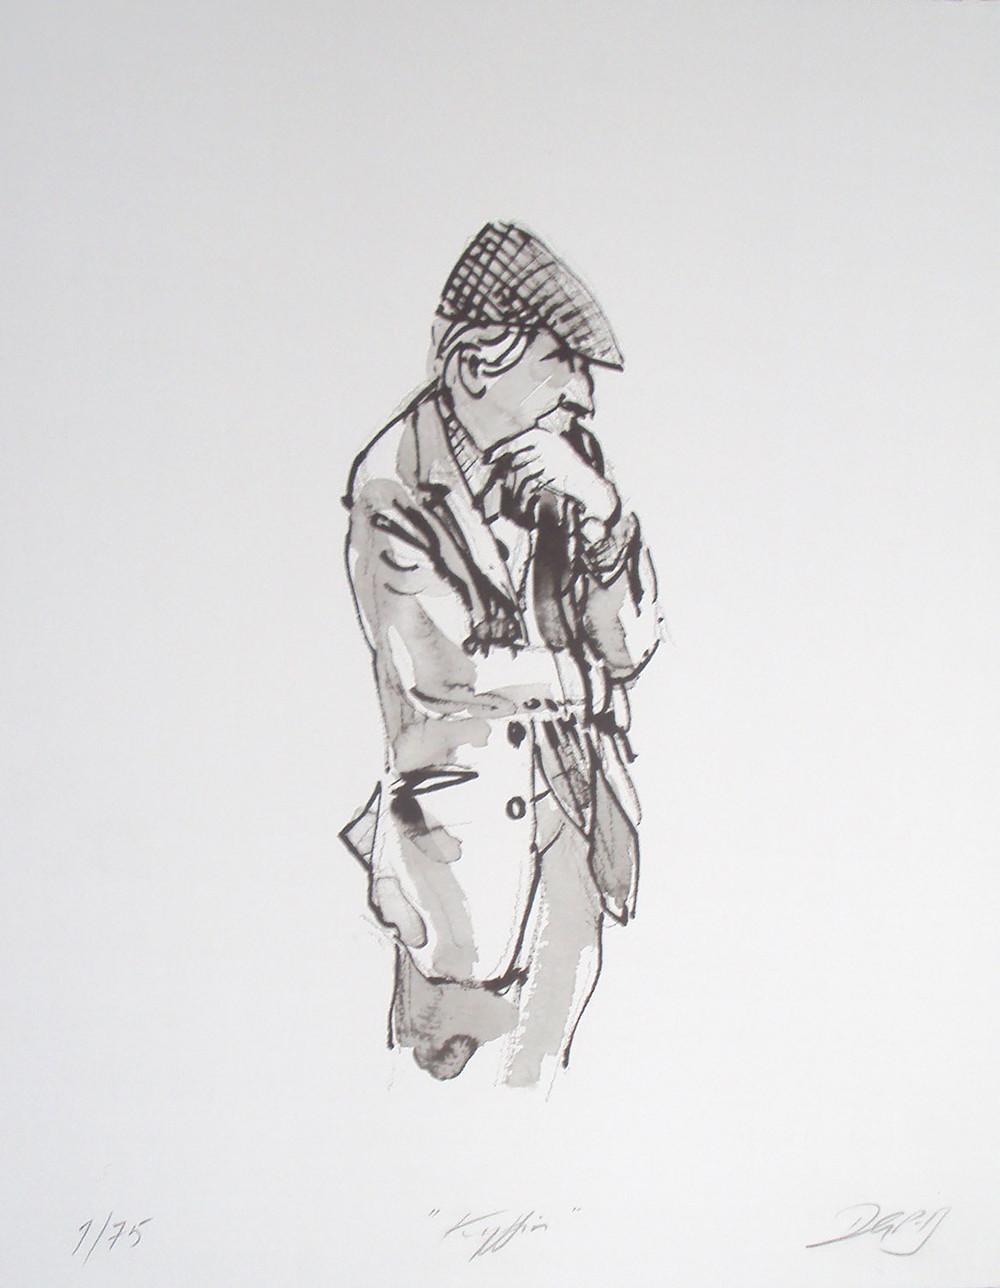 'Sir Kyffin Williams' by David Porteous-Butler